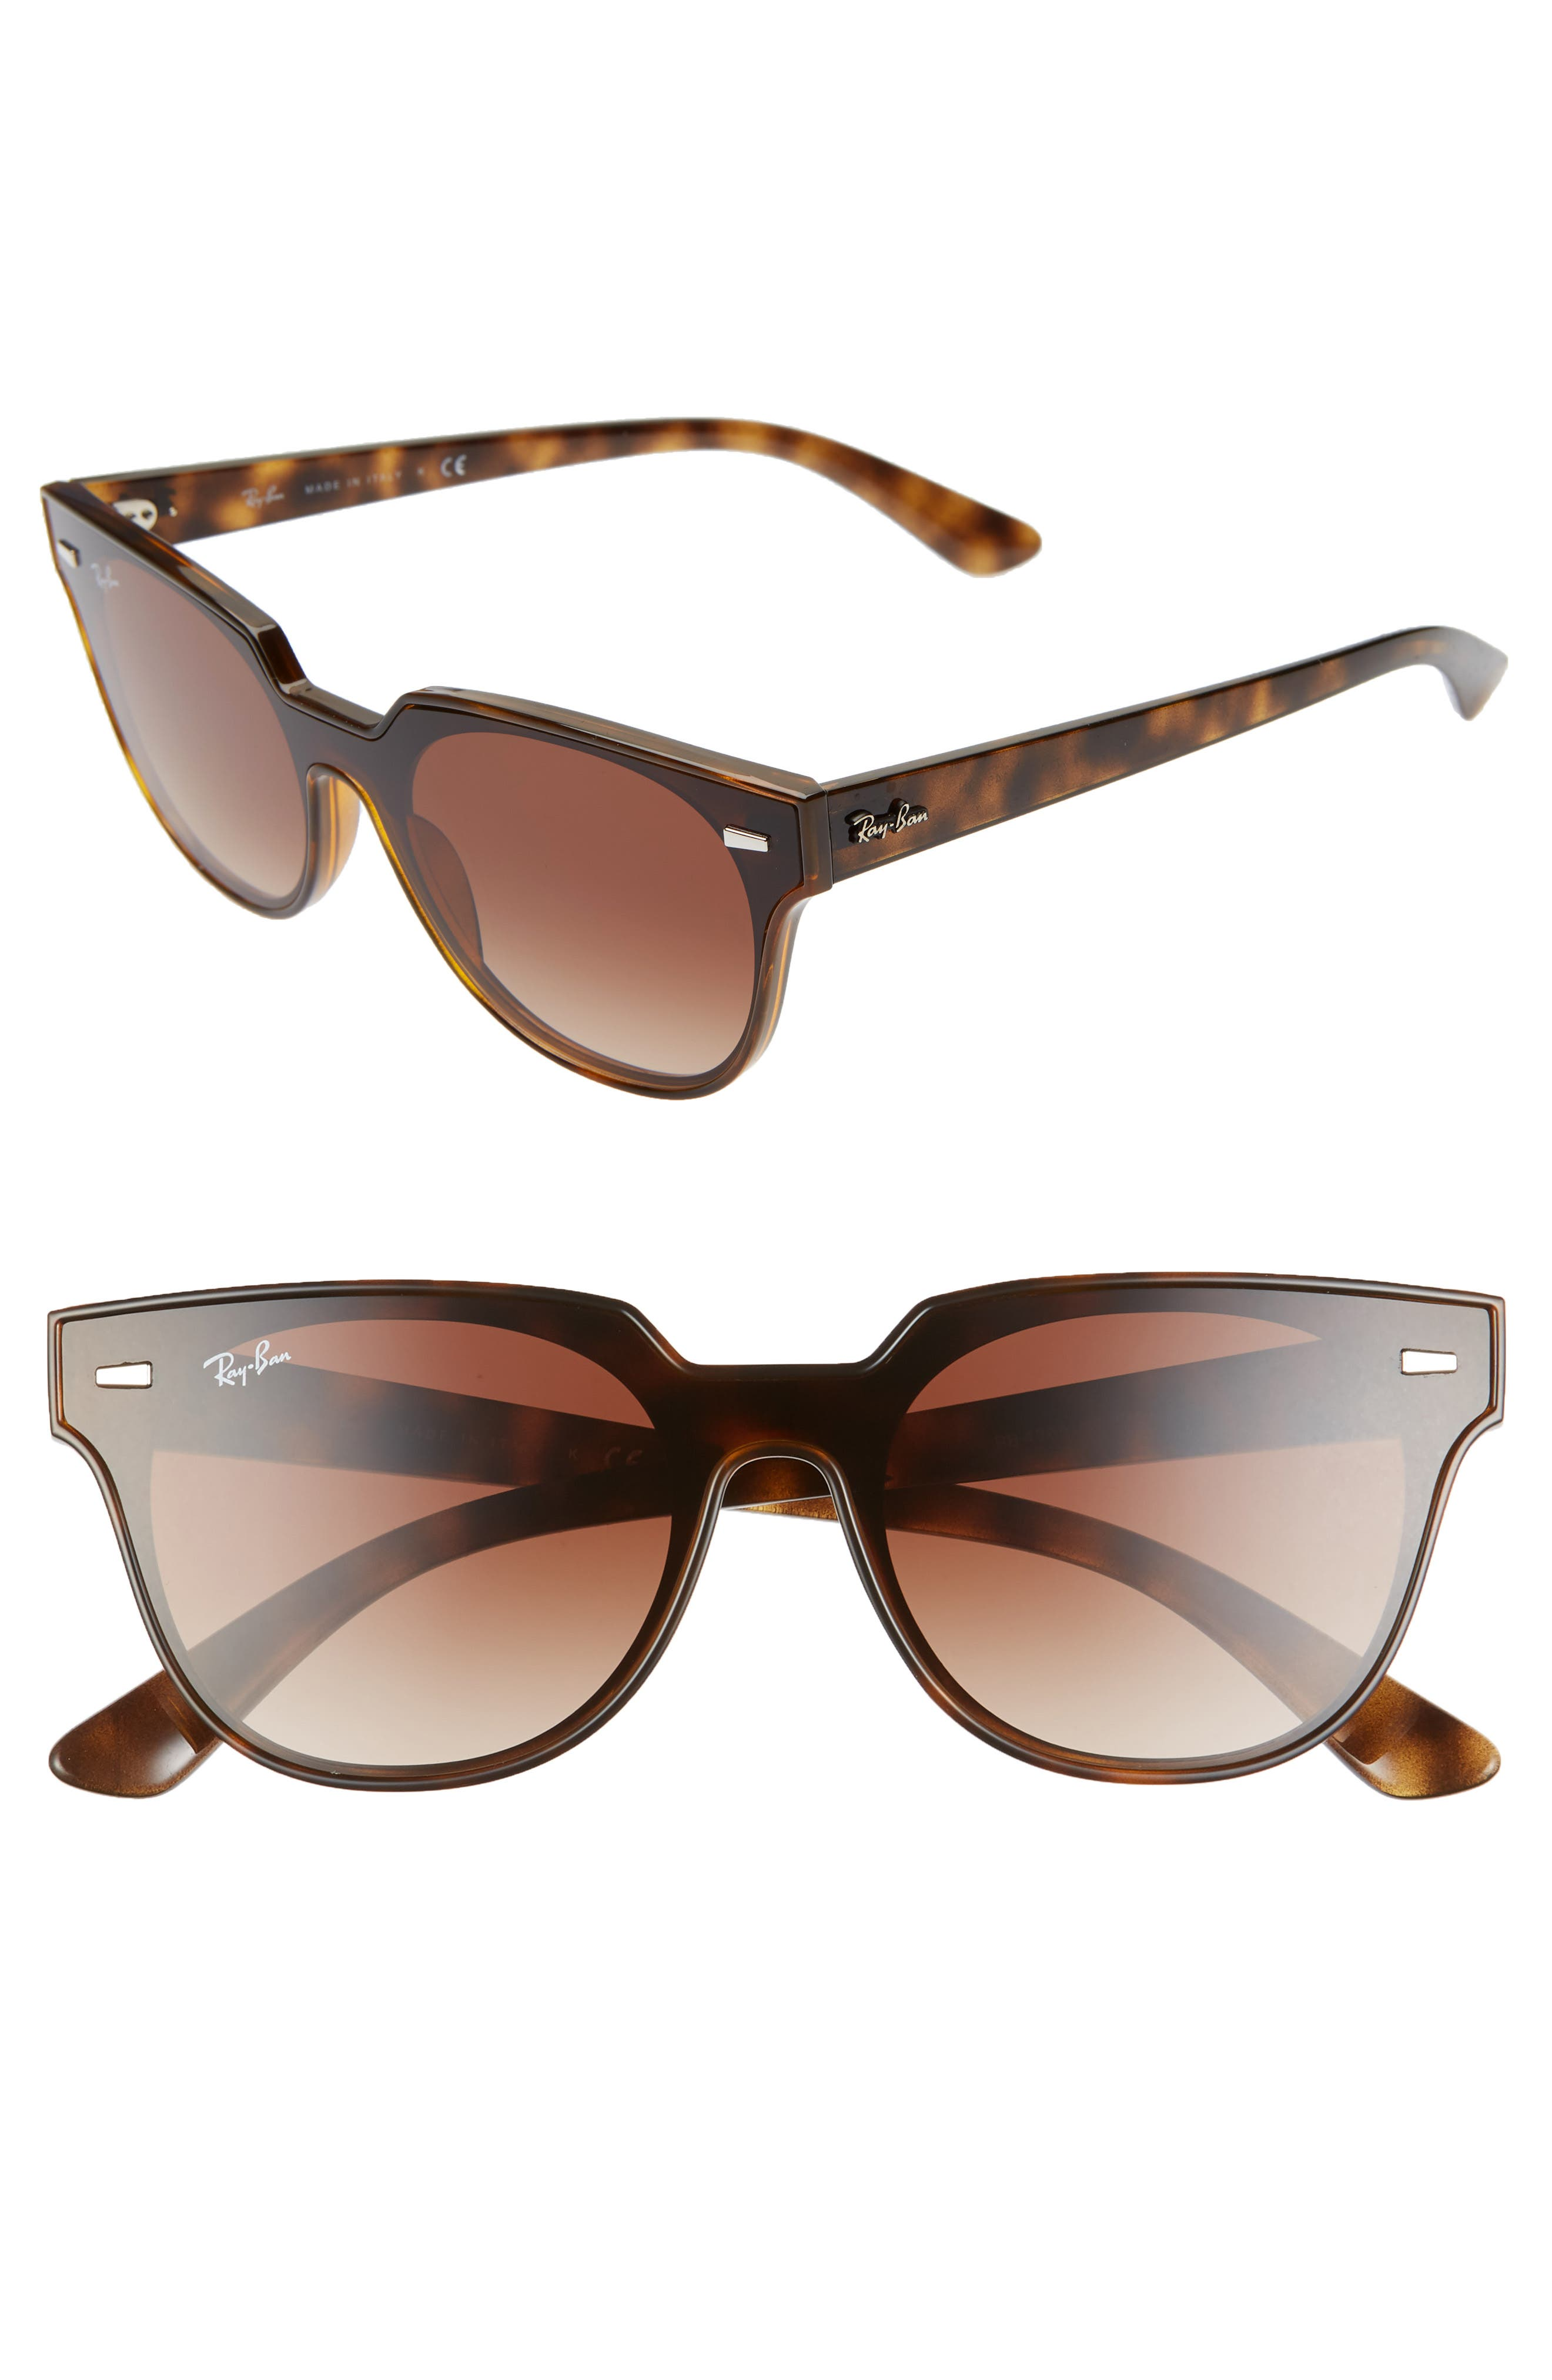 Ray-Ban Blaze Meteor 145Mm Gradient Shield Sunglasses - Havana/ Brown Solid